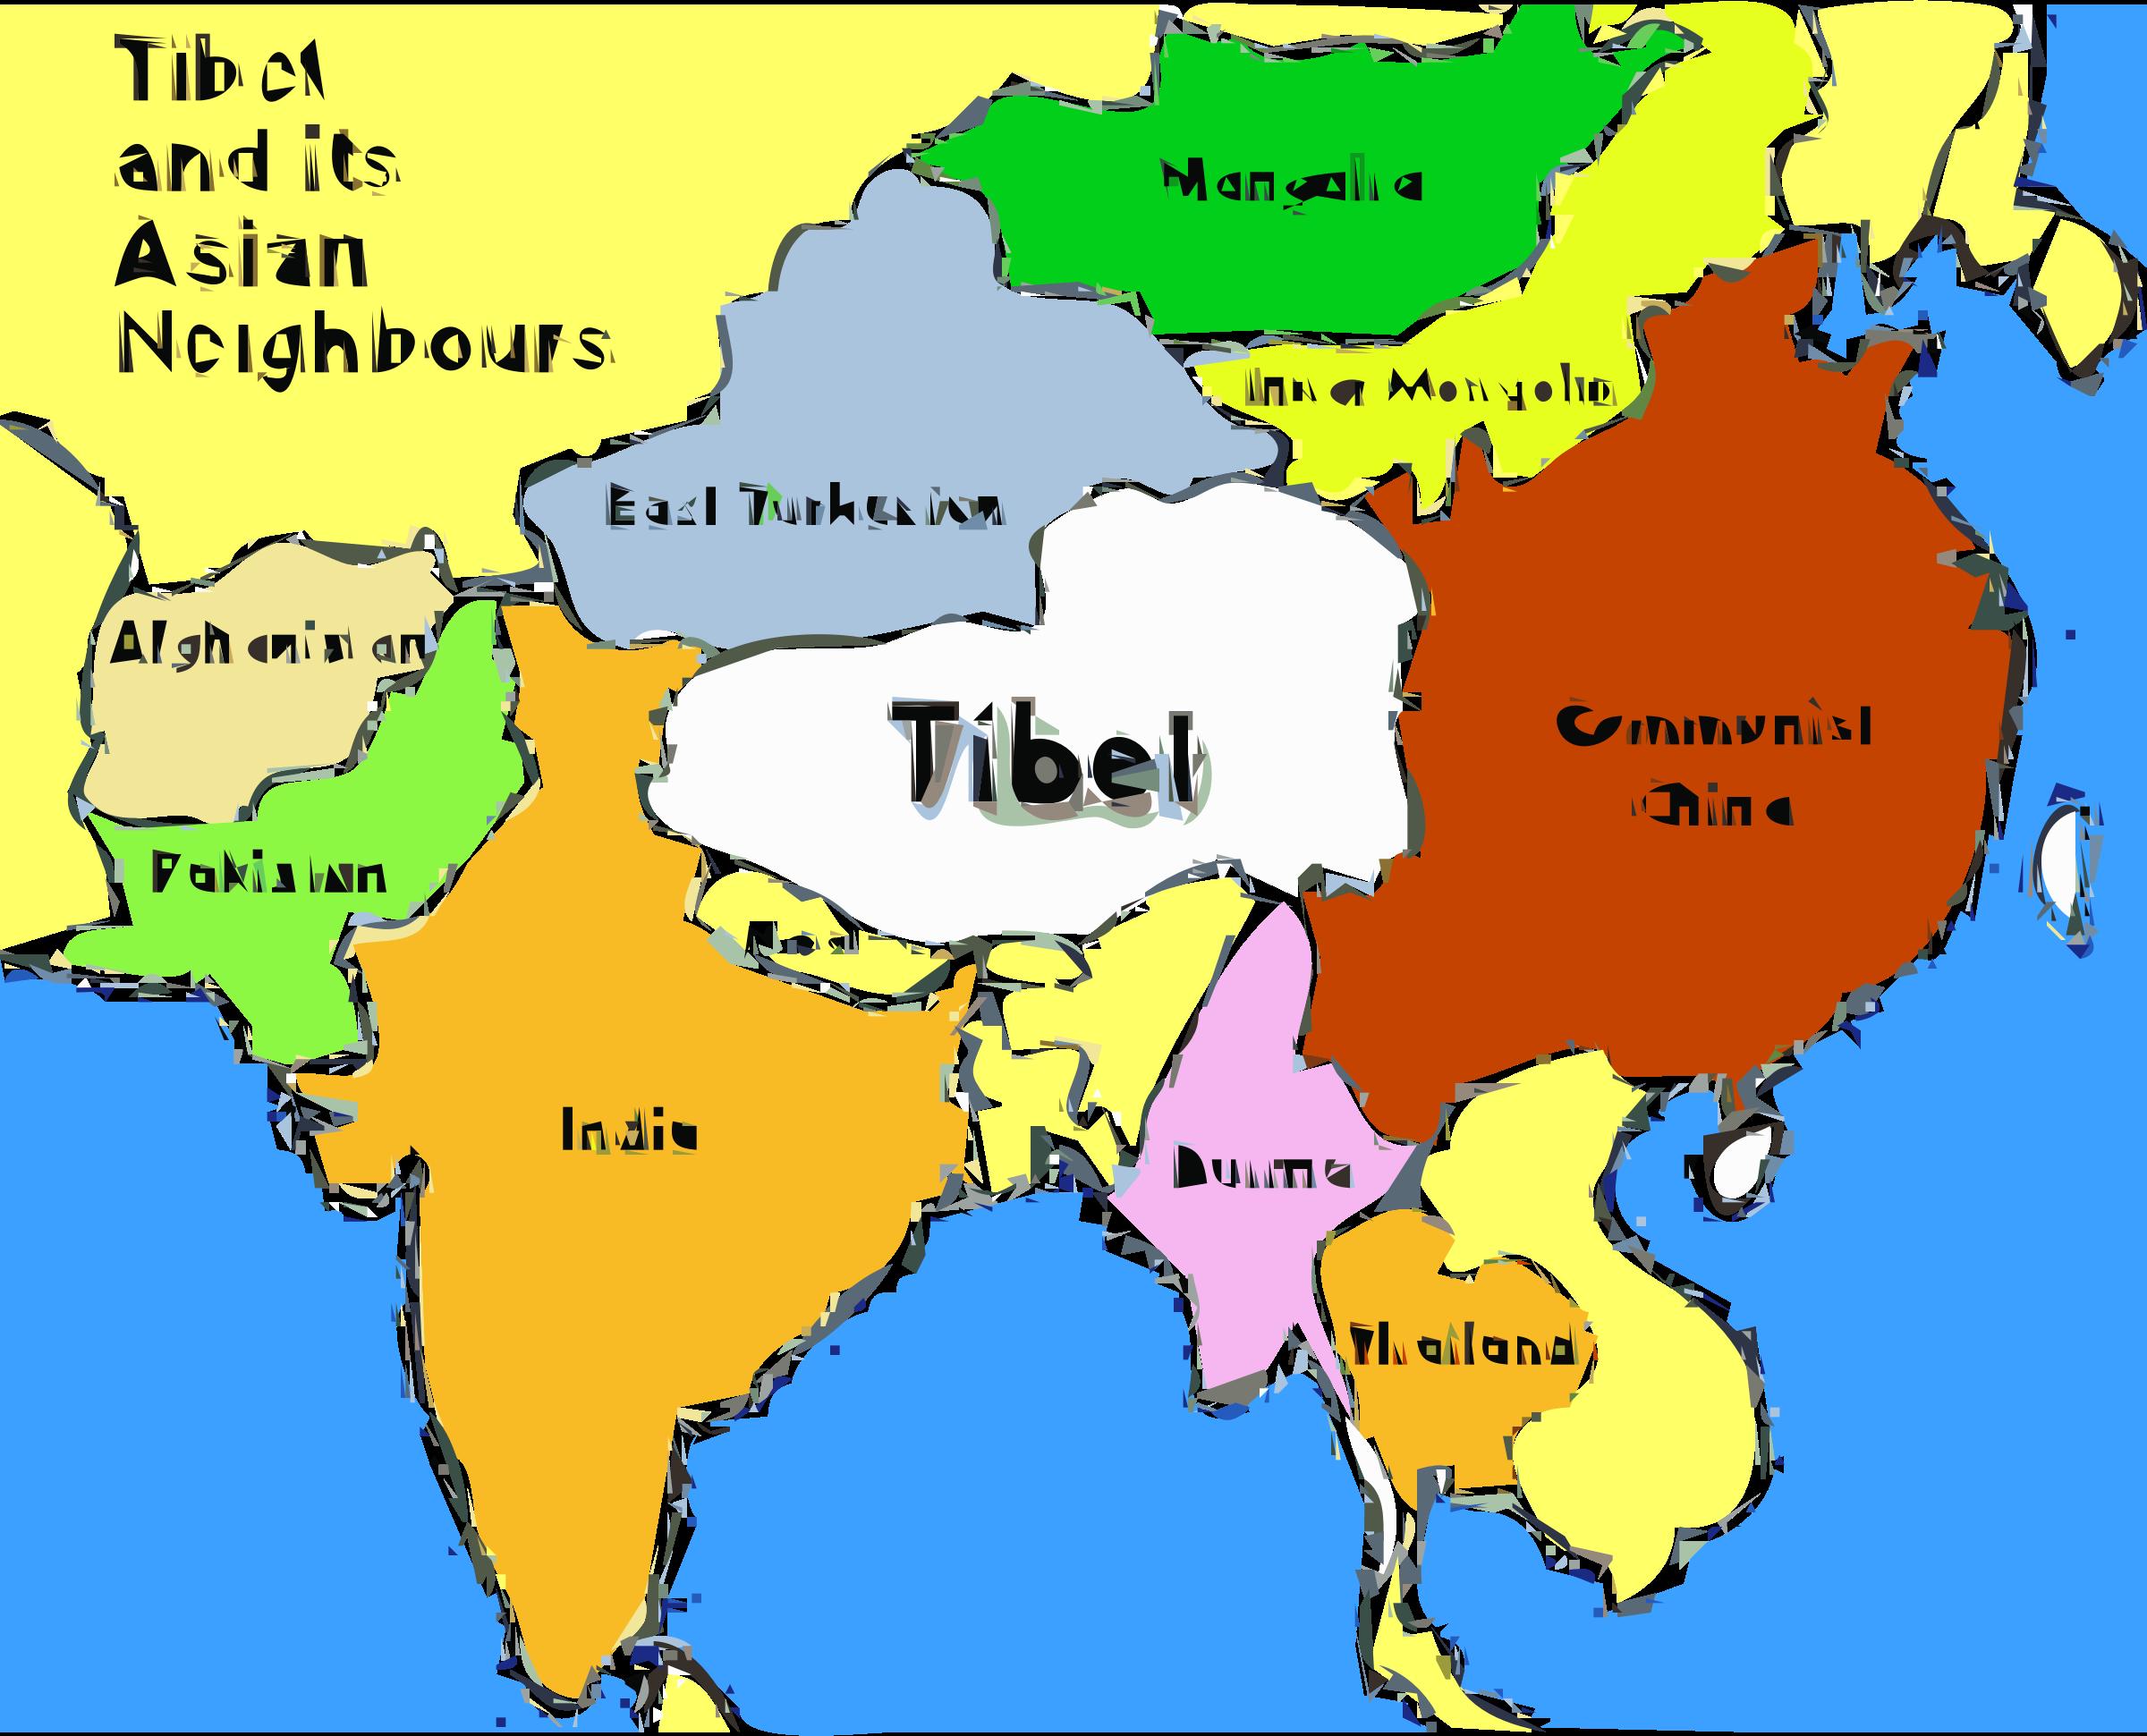 Tibetan long book clipart banner black and white Clipart - Tibet map banner black and white